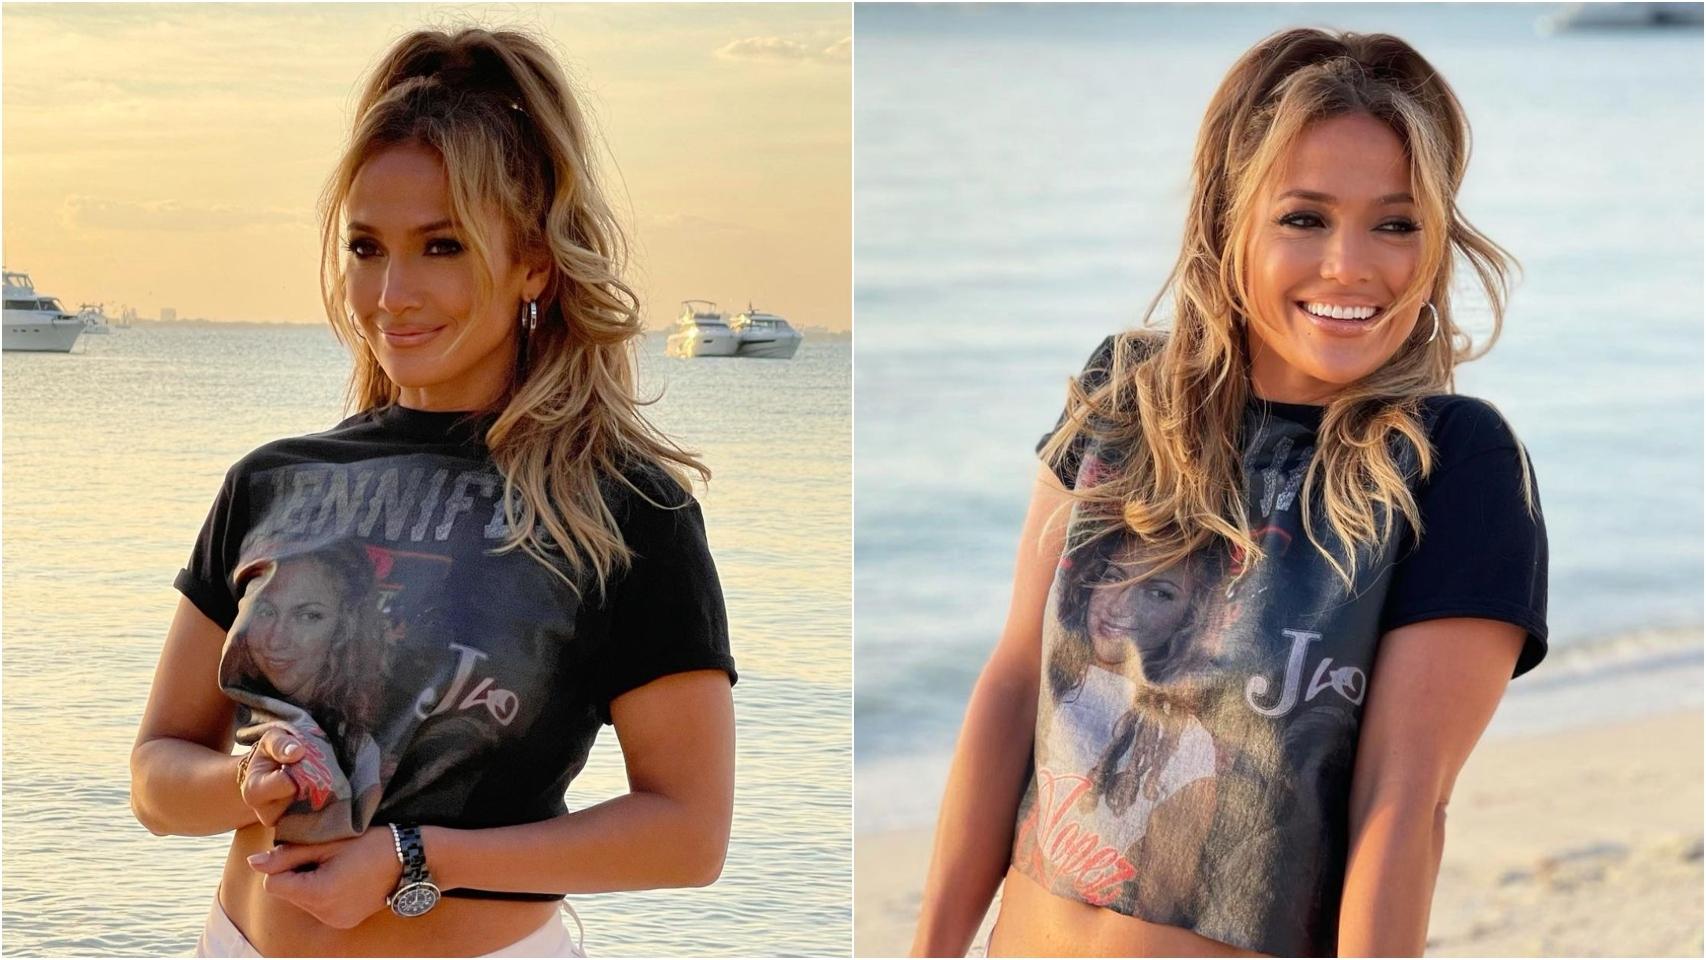 Jennifer Lopez haciendo un homenaje a su vídeo para 'Love don't cost a thing'.